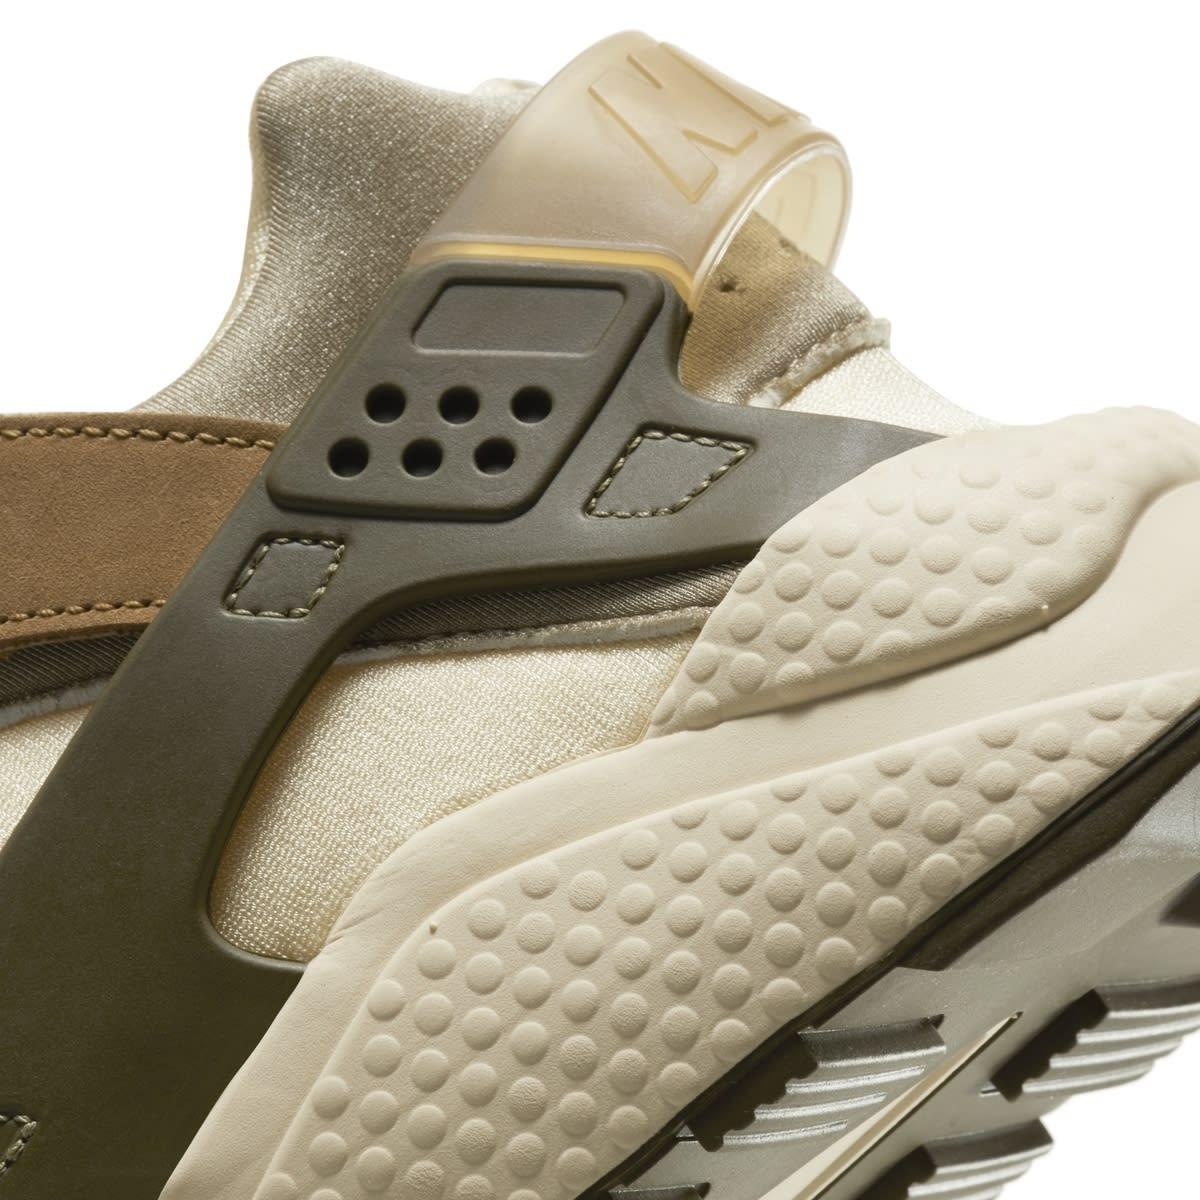 Stussy x Nike Air Huarache 'Desert Oak/Reed/Light Straw' DD1381-200 (Heel Detail)